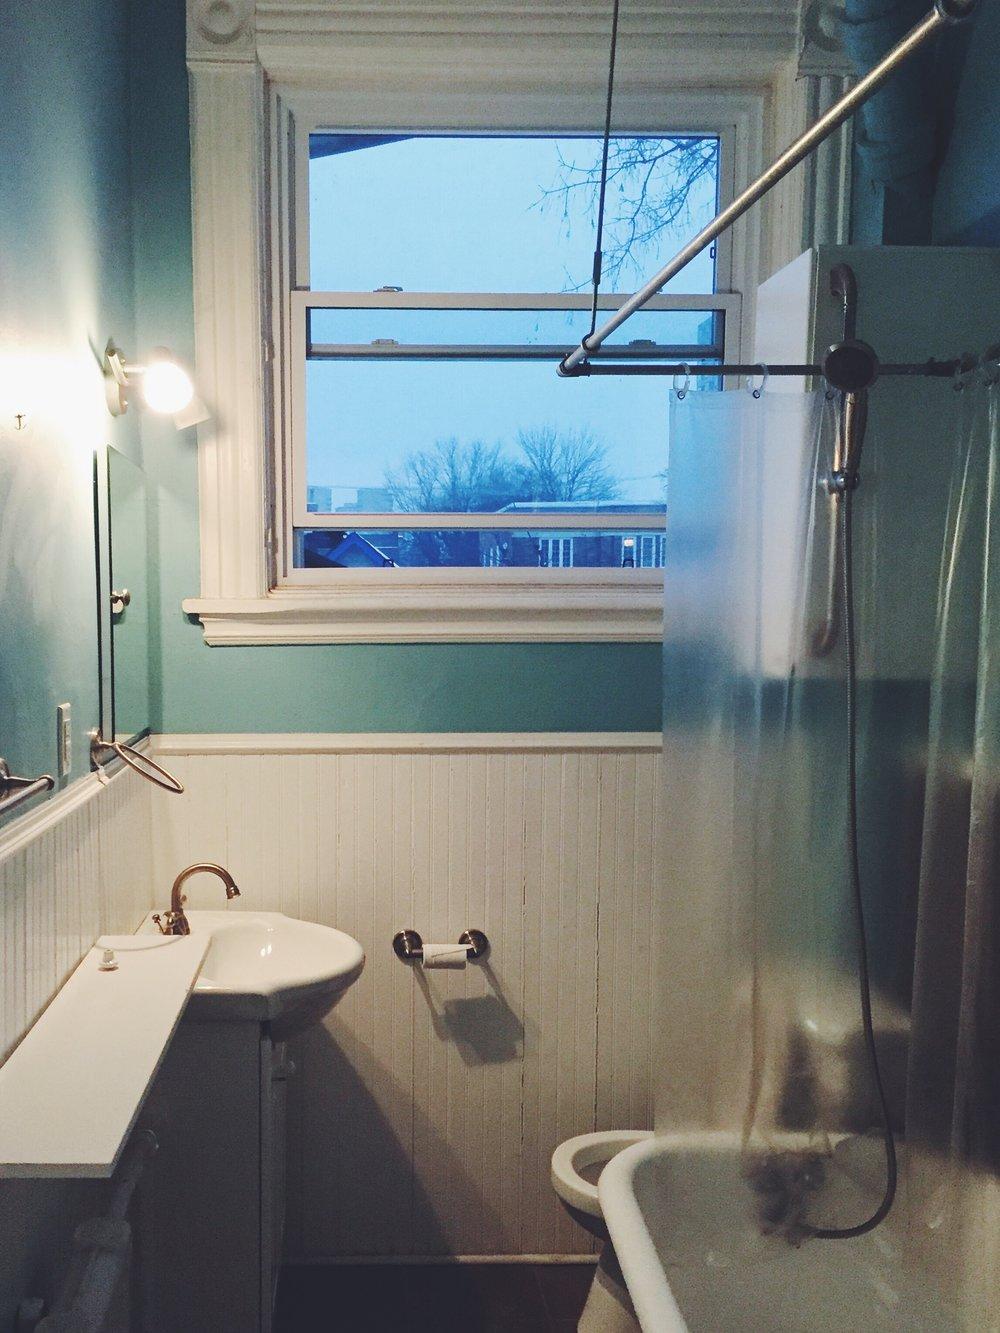 Bathroom, before. Particle board side shelf, storage cupboard blocking view when in bath.